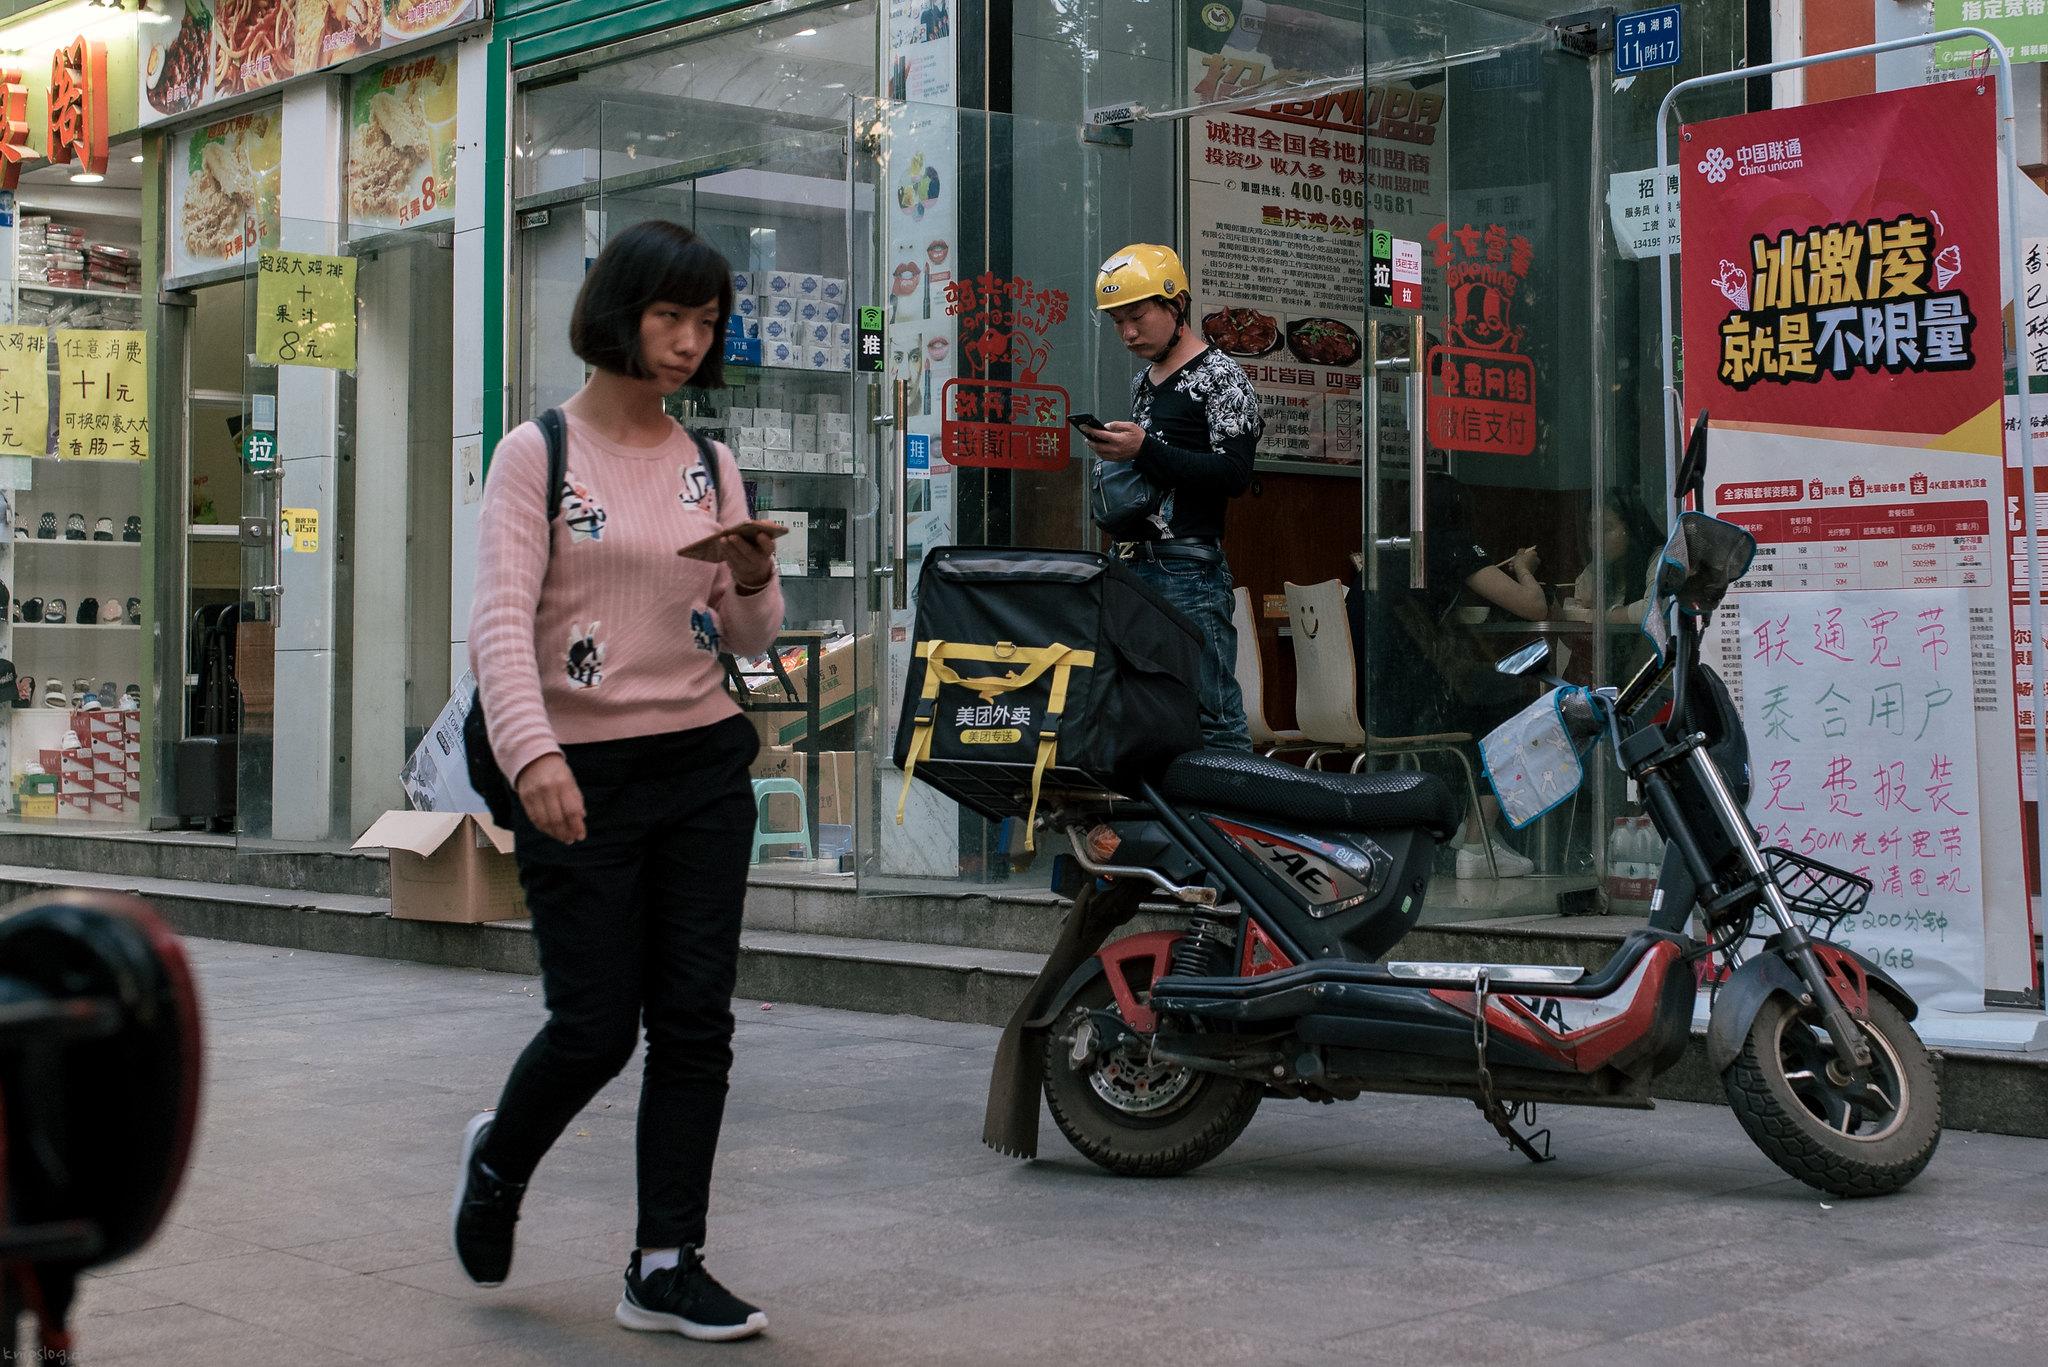 Chinese lieferando